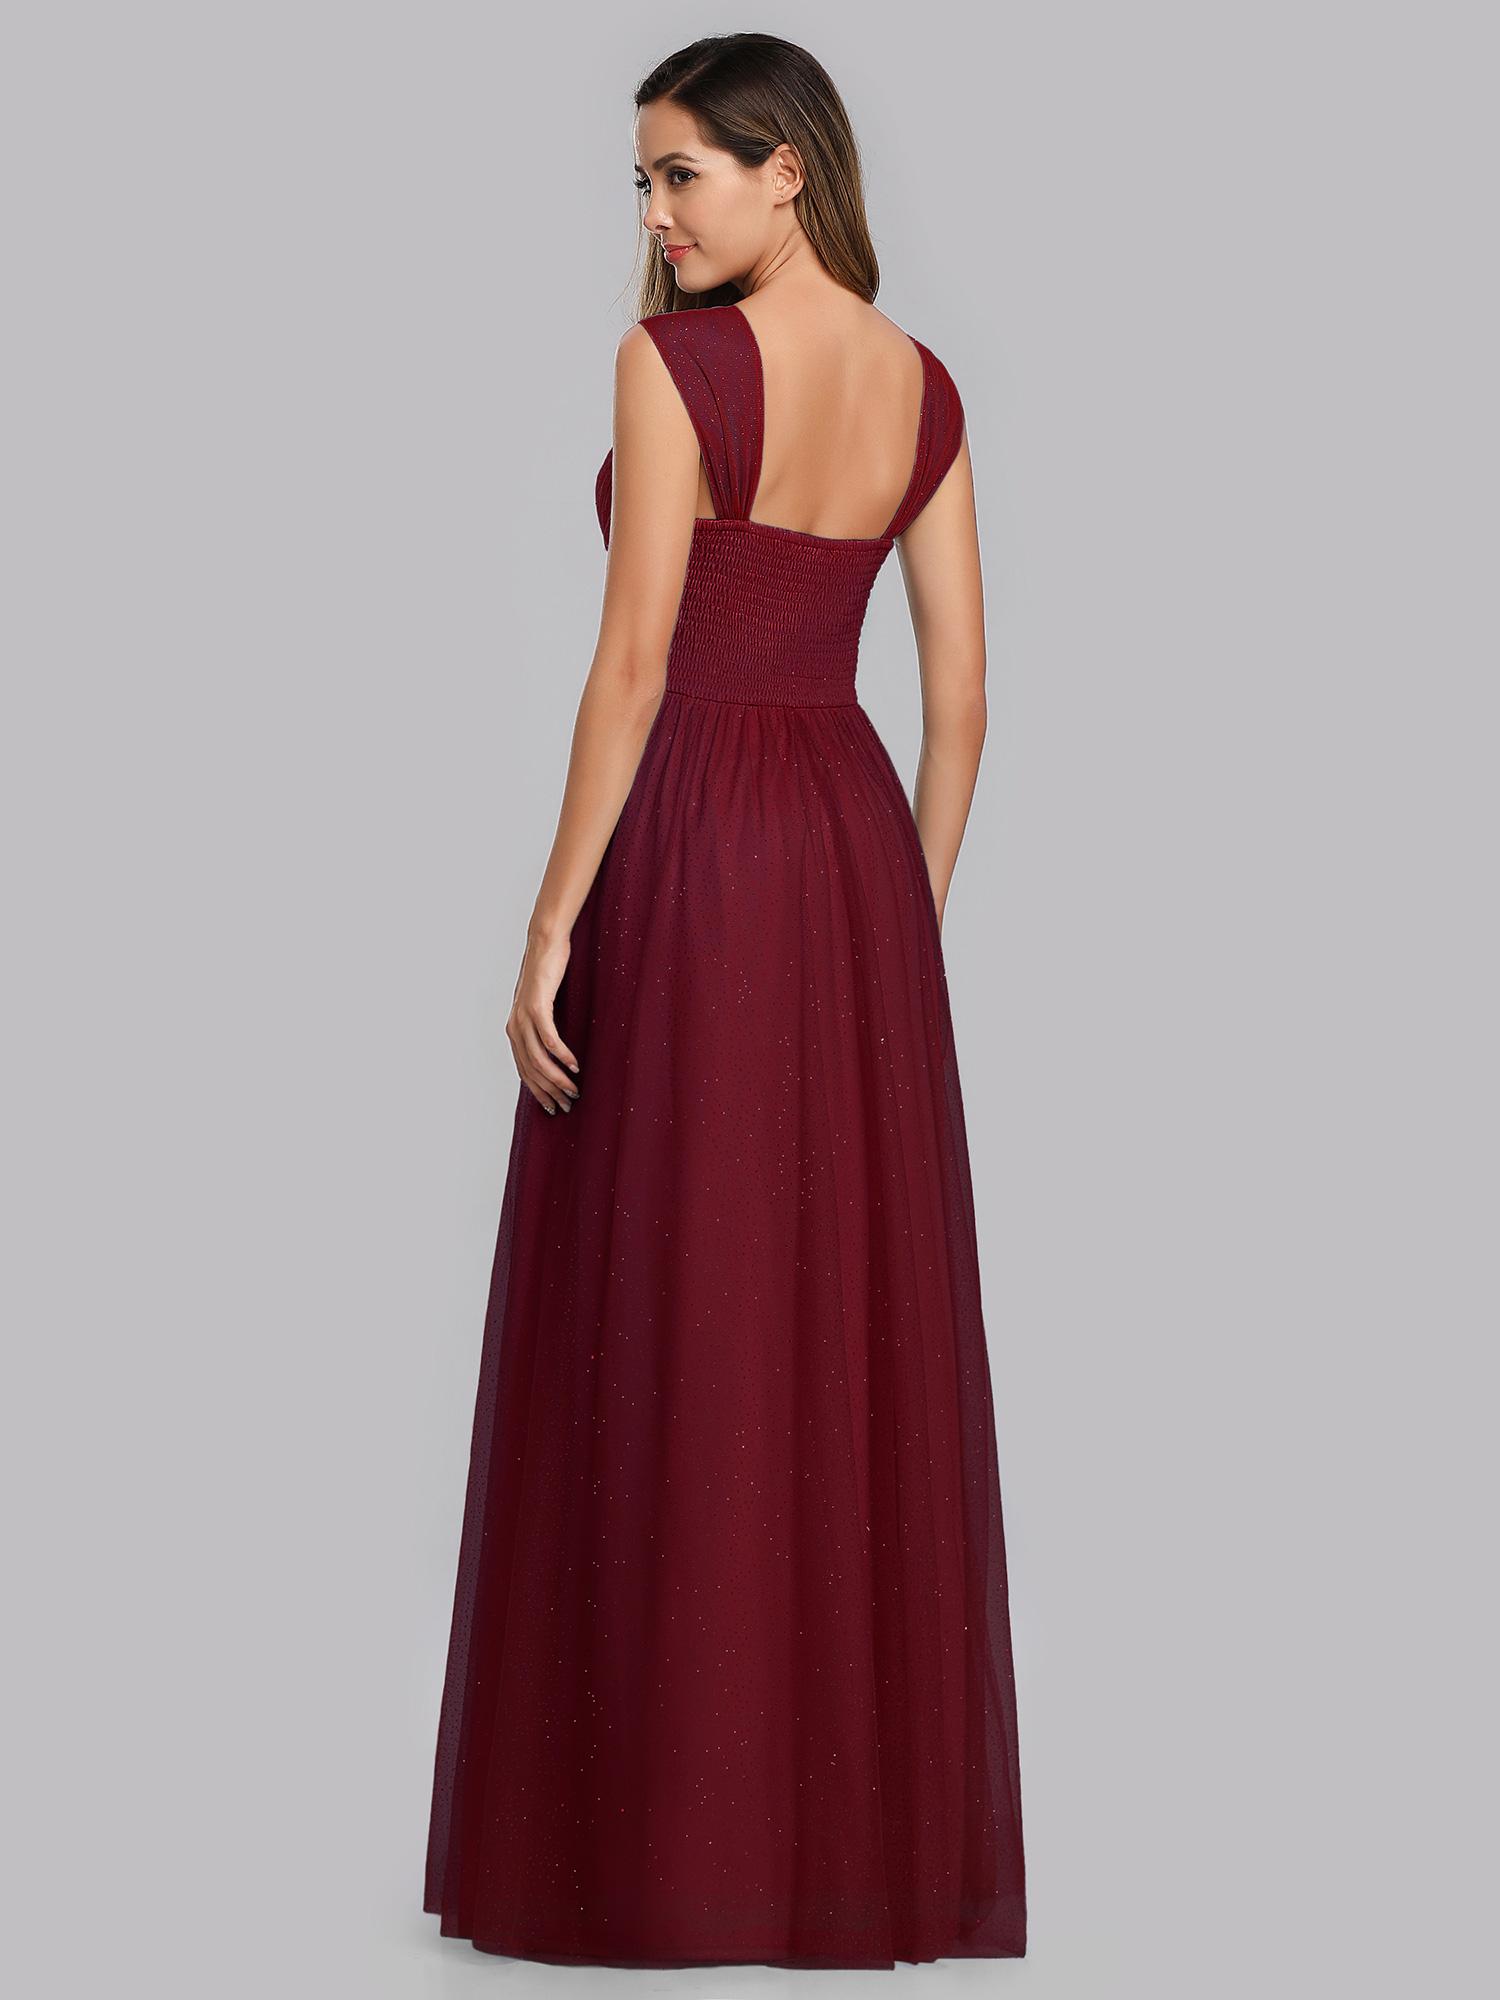 Ever-Pretty Burgundy V-neck Bridesmaid Dresses Backless A-line Wedding Prom Gown